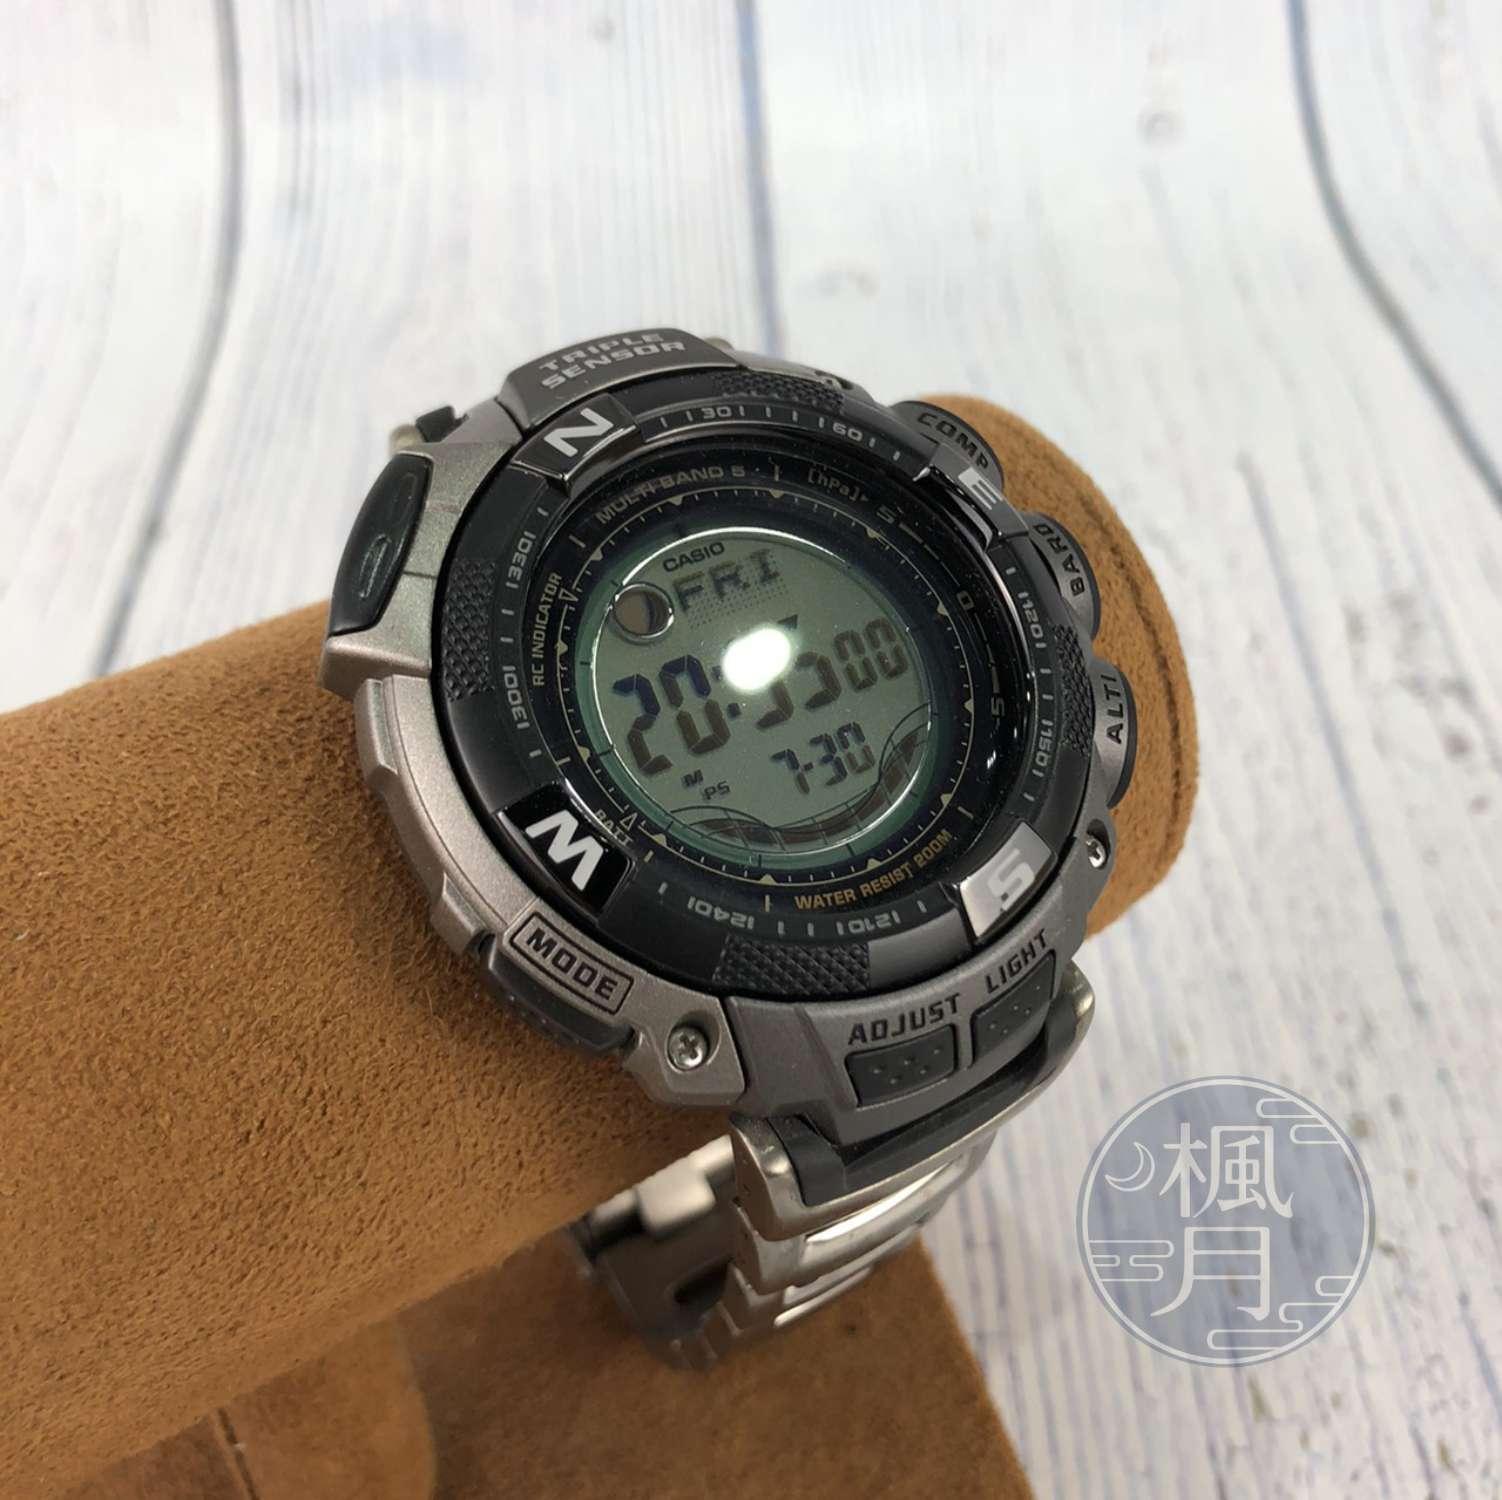 BRAND楓月 CASIO 卡西歐 PAW-1500T 金屬面數字錶大圓鈕 電子錶 手錶 腕錶 時計 大錶徑